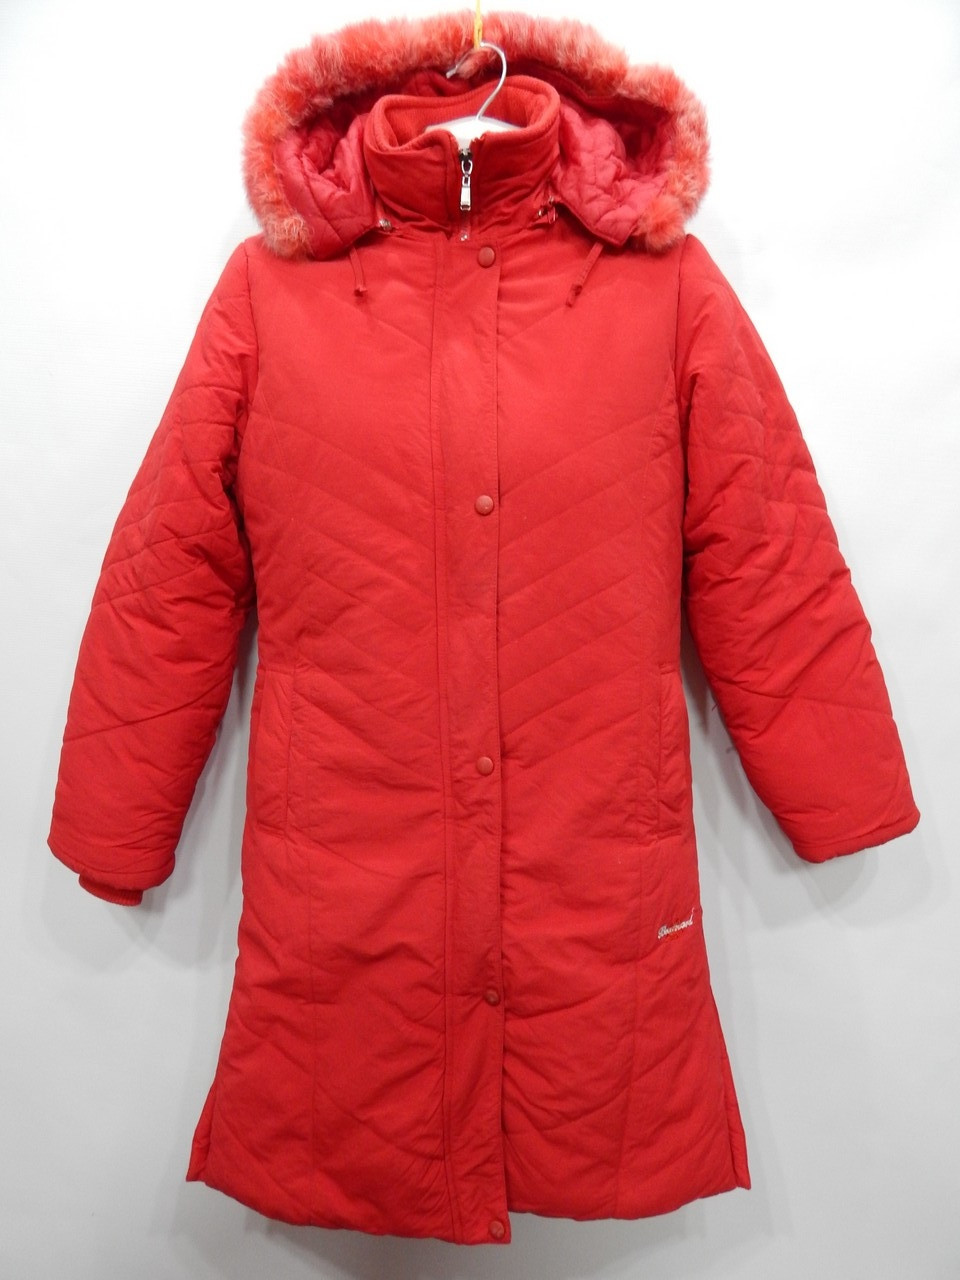 Куртка - пальто  женская теплая с капюшоном BOULEVARD  р.44-46 053GK